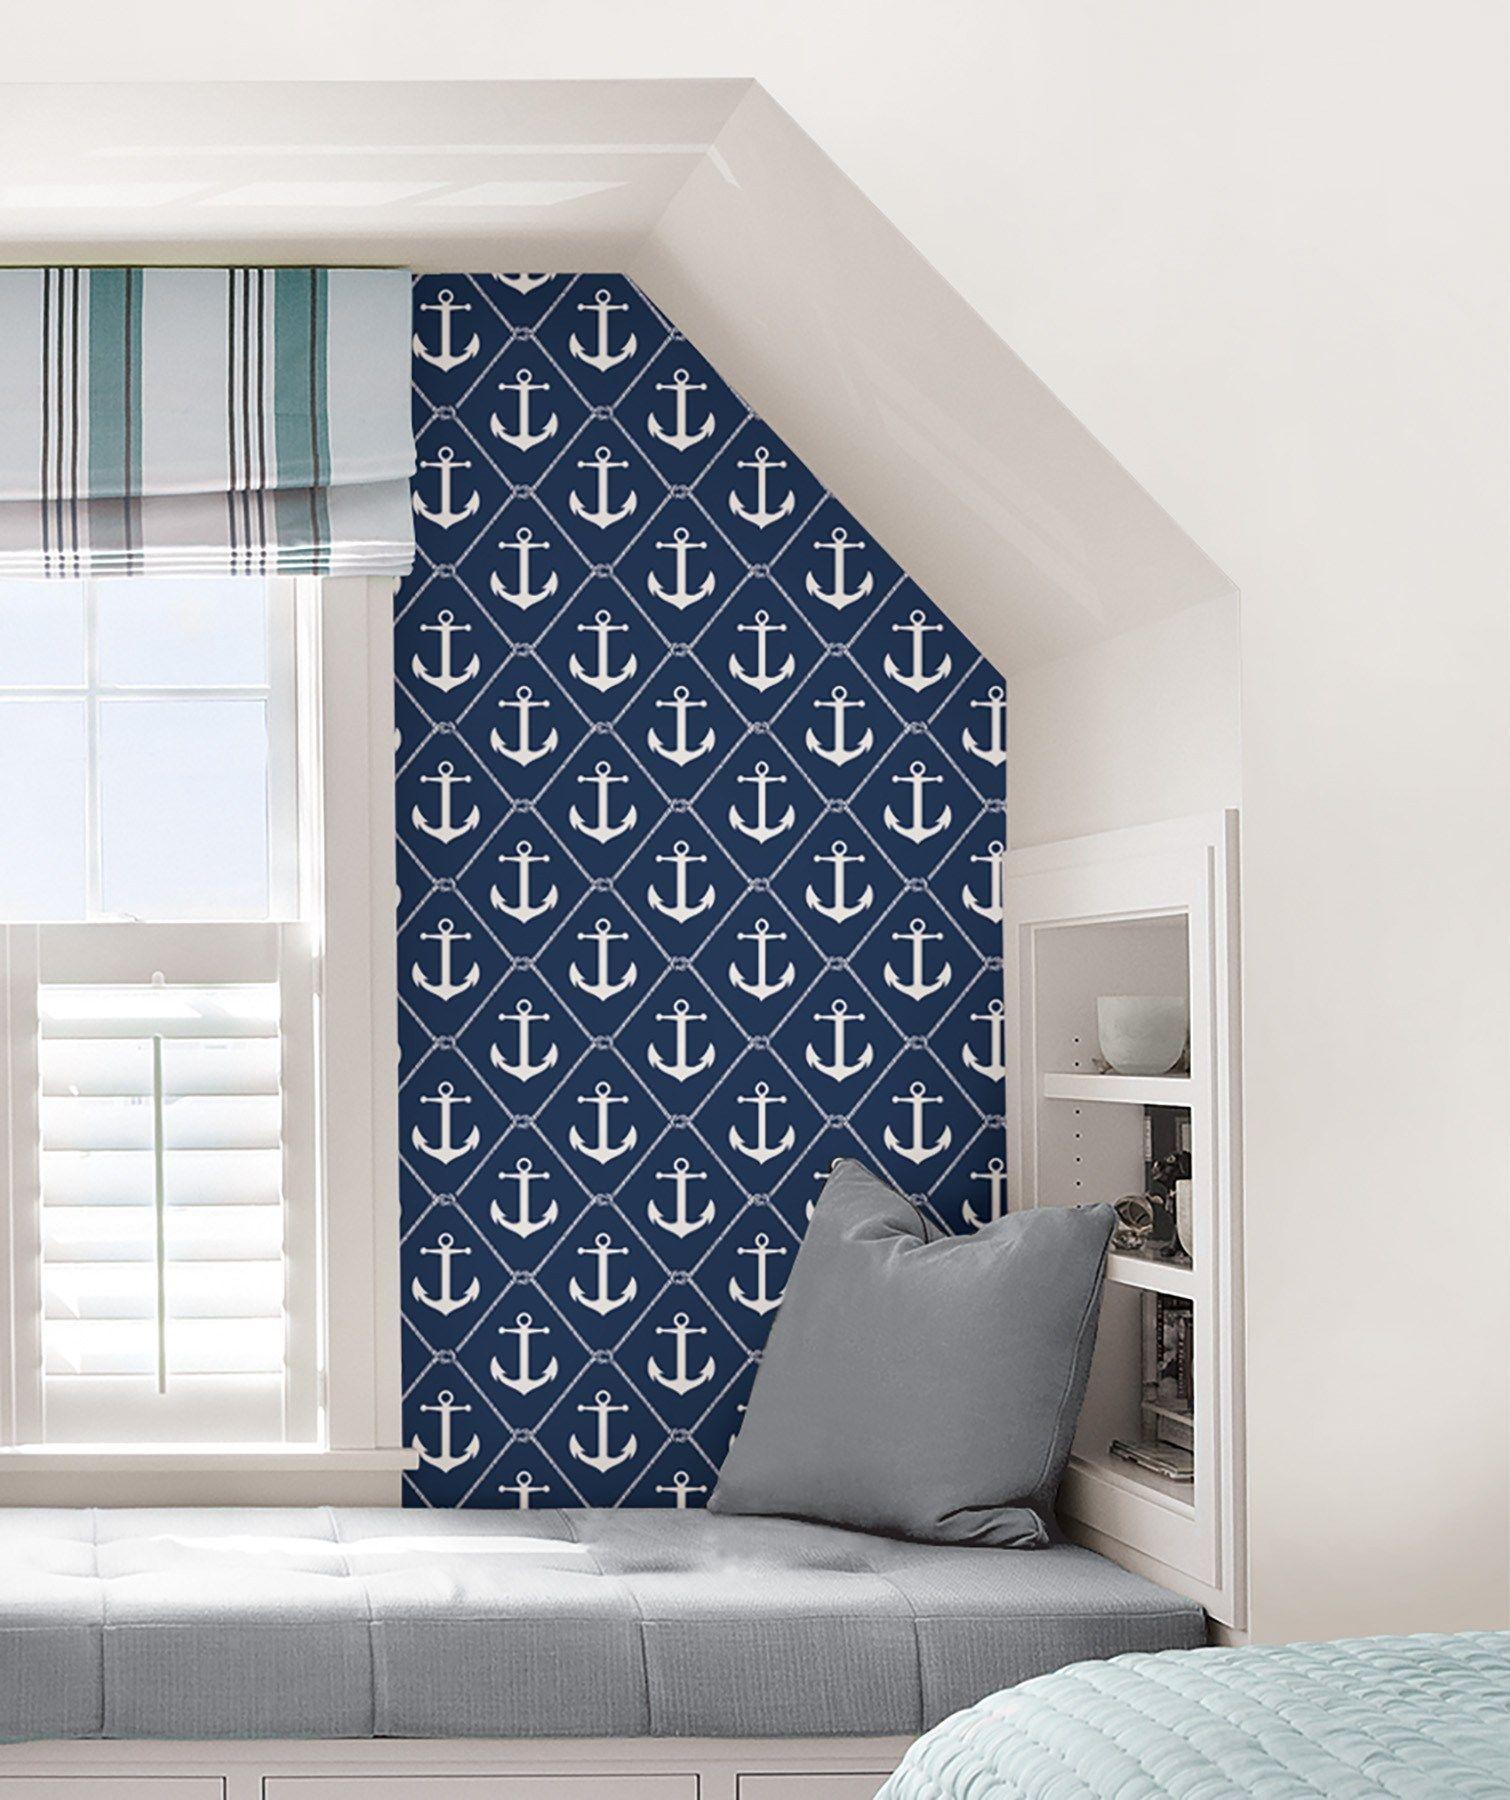 Set Sail Navy Peel and Stick Wallpaper Navy home decor